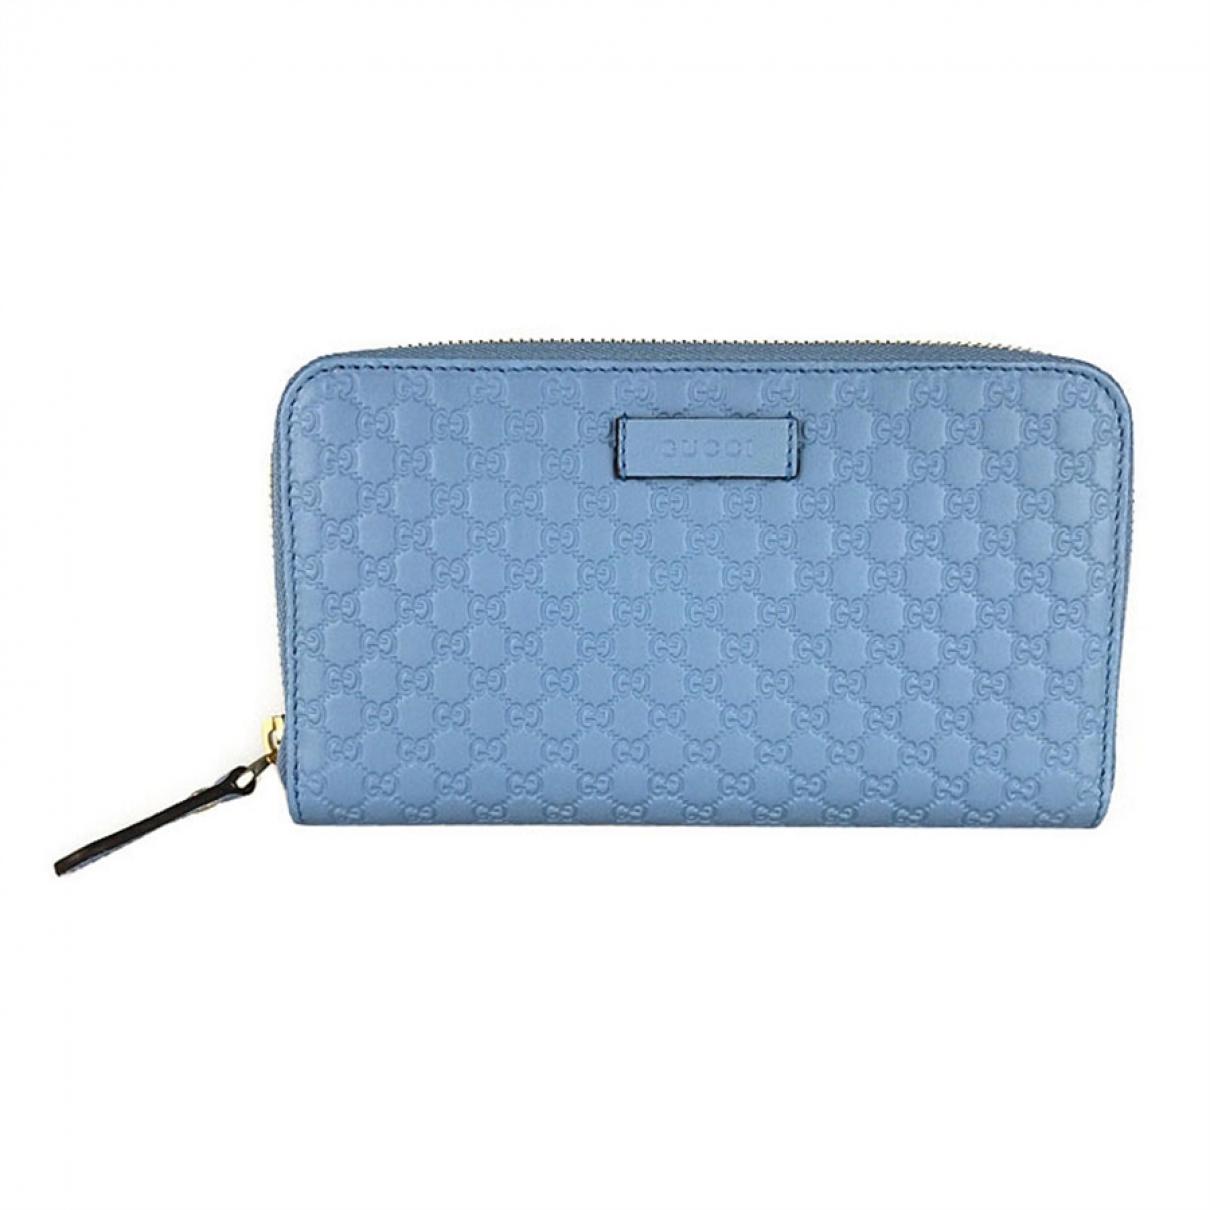 Gucci \N Portemonnaie in  Blau Leder